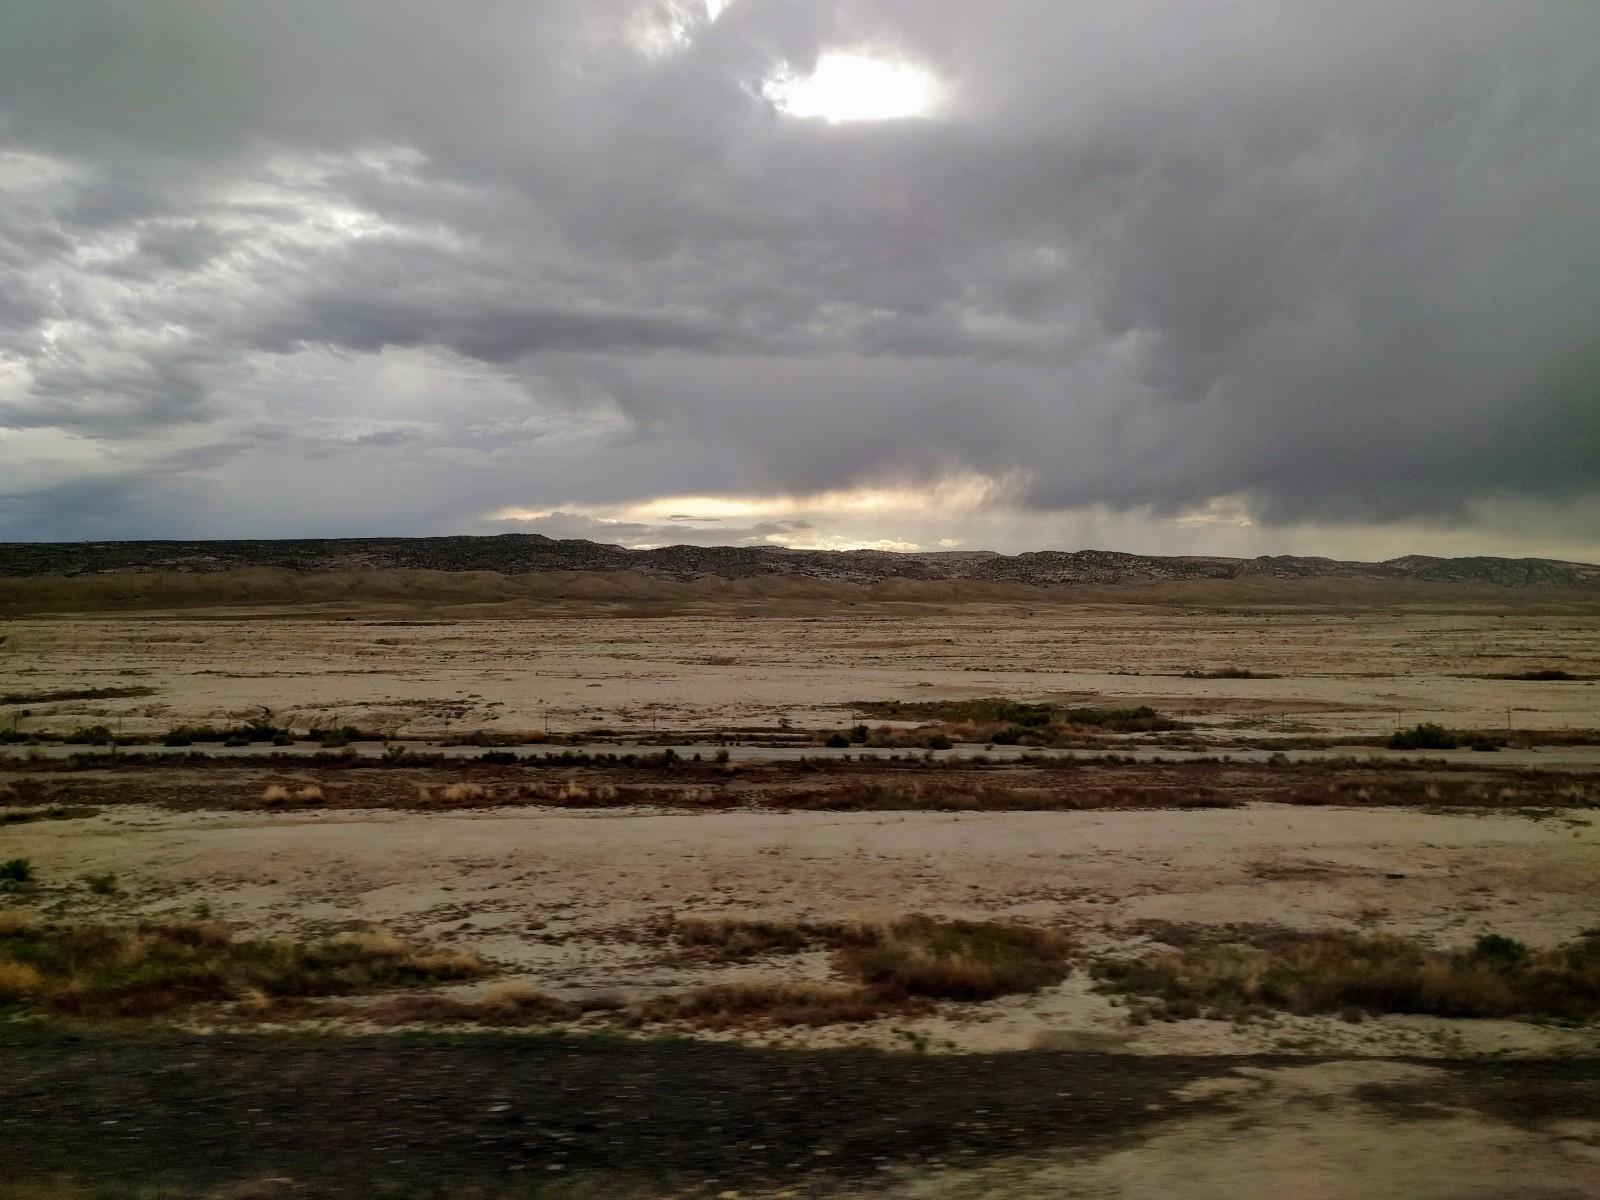 Nevada was a vast stretch of barren lands.